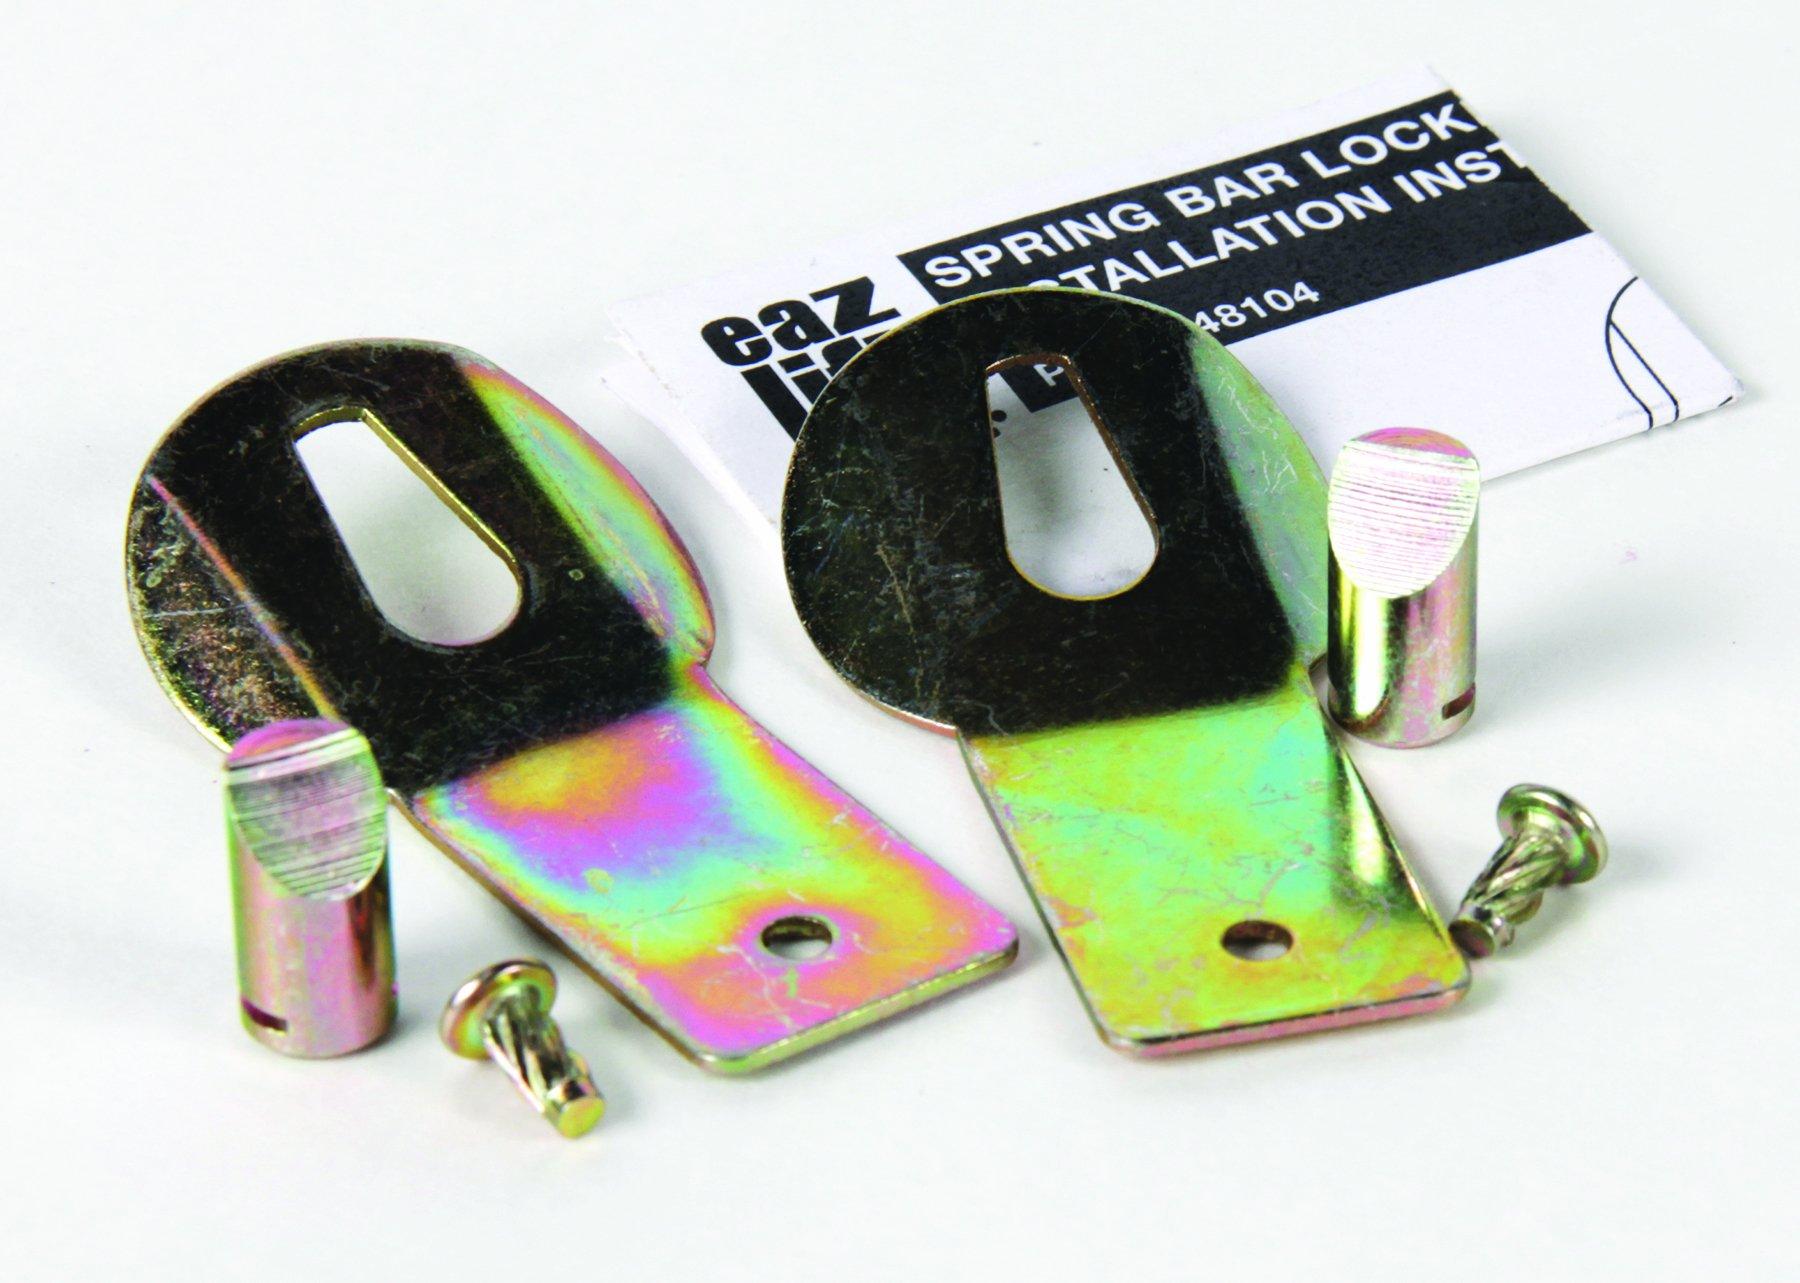 EAZ LIFT Accessories Spring Bar Locking Device Repair Kit (48104) by EAZ LIFT